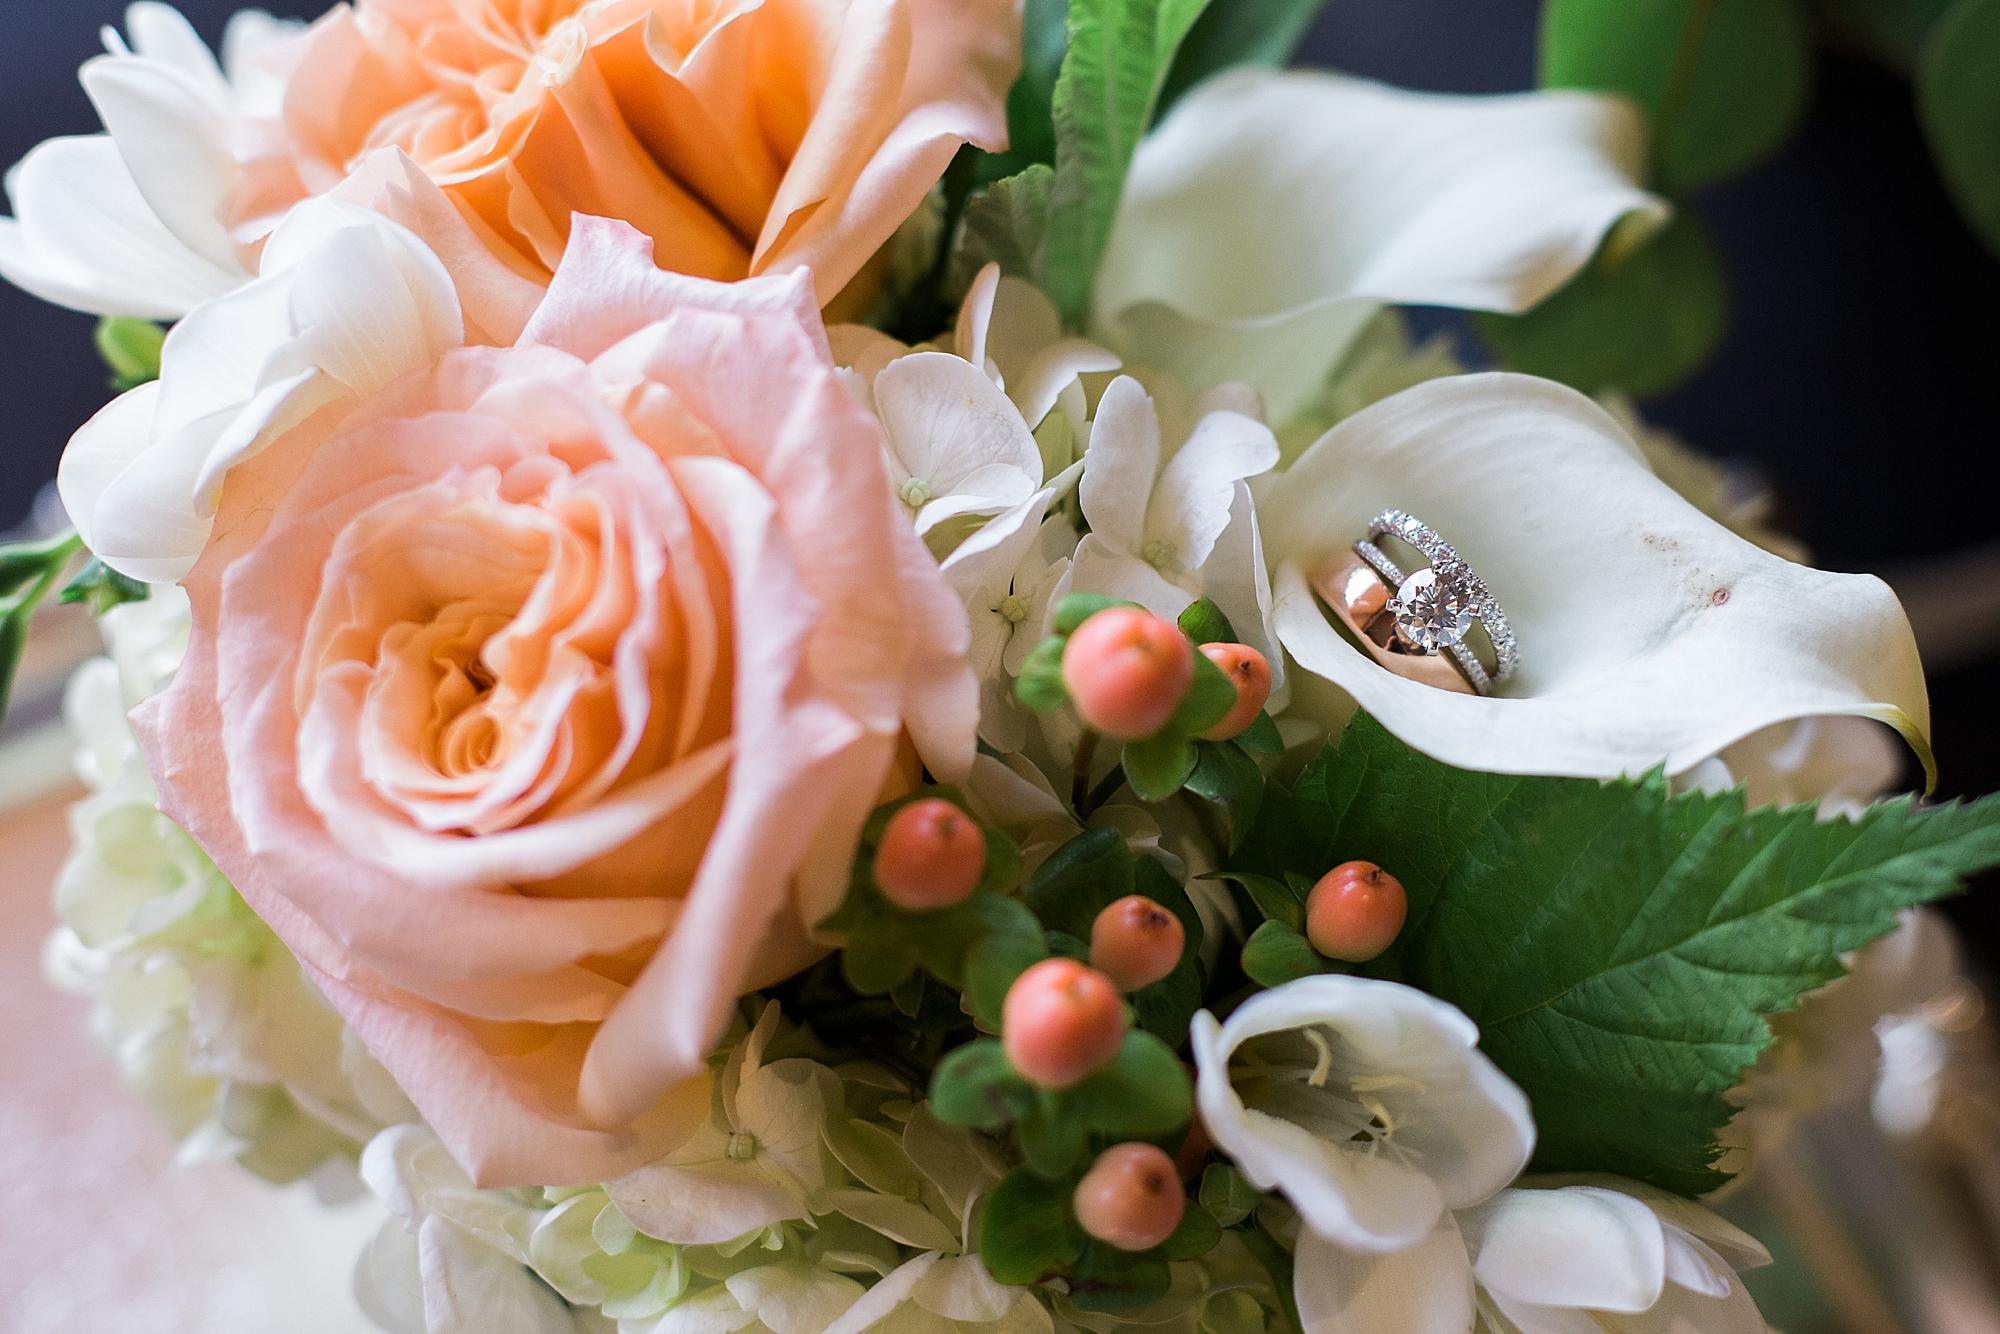 seattle wedding, wedding planner, wedding planner seattle, seattle wedding photographer, seattle bride, seattle bride magazine